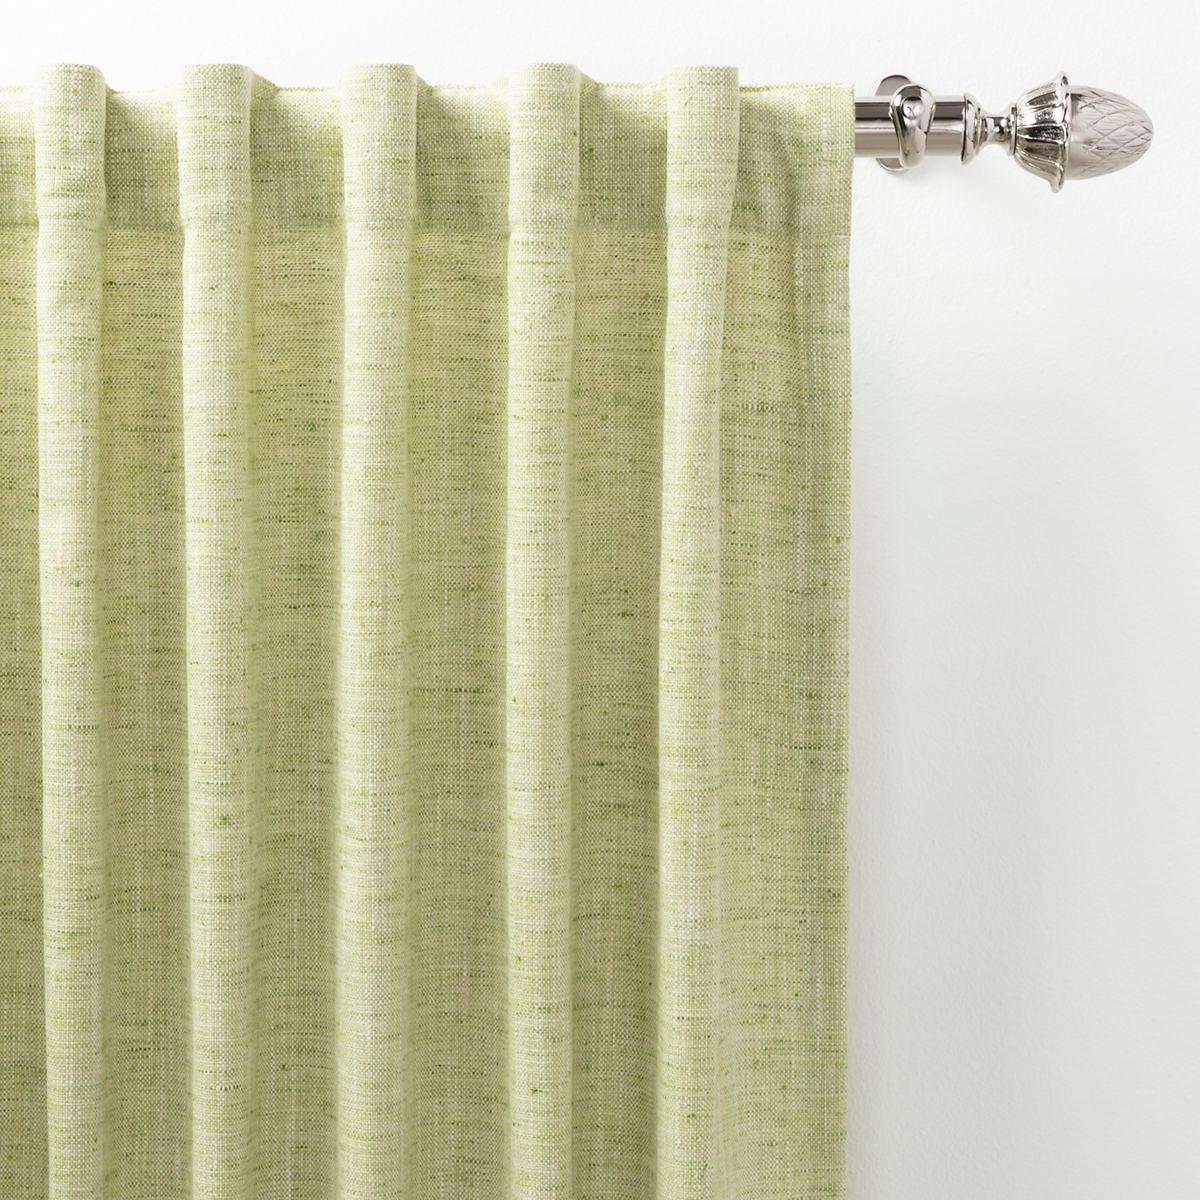 Greylock Soft Green Indoor/Outdoor Curtain Panel